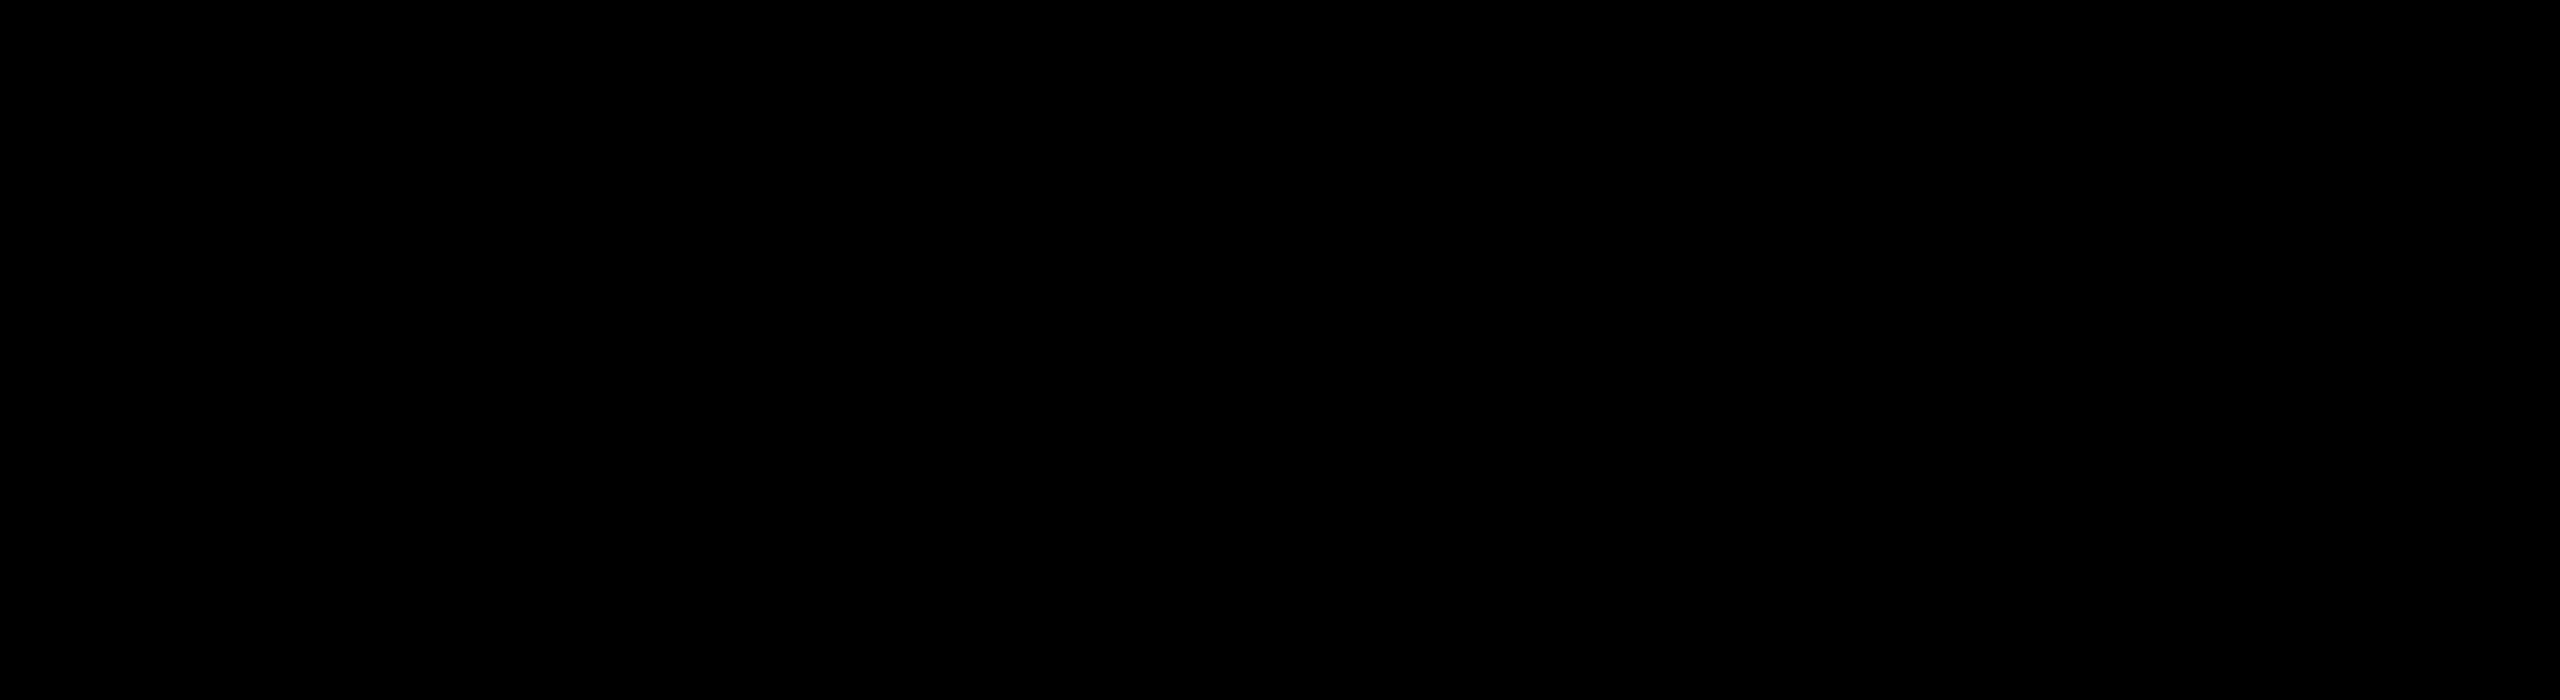 Key Of G Major